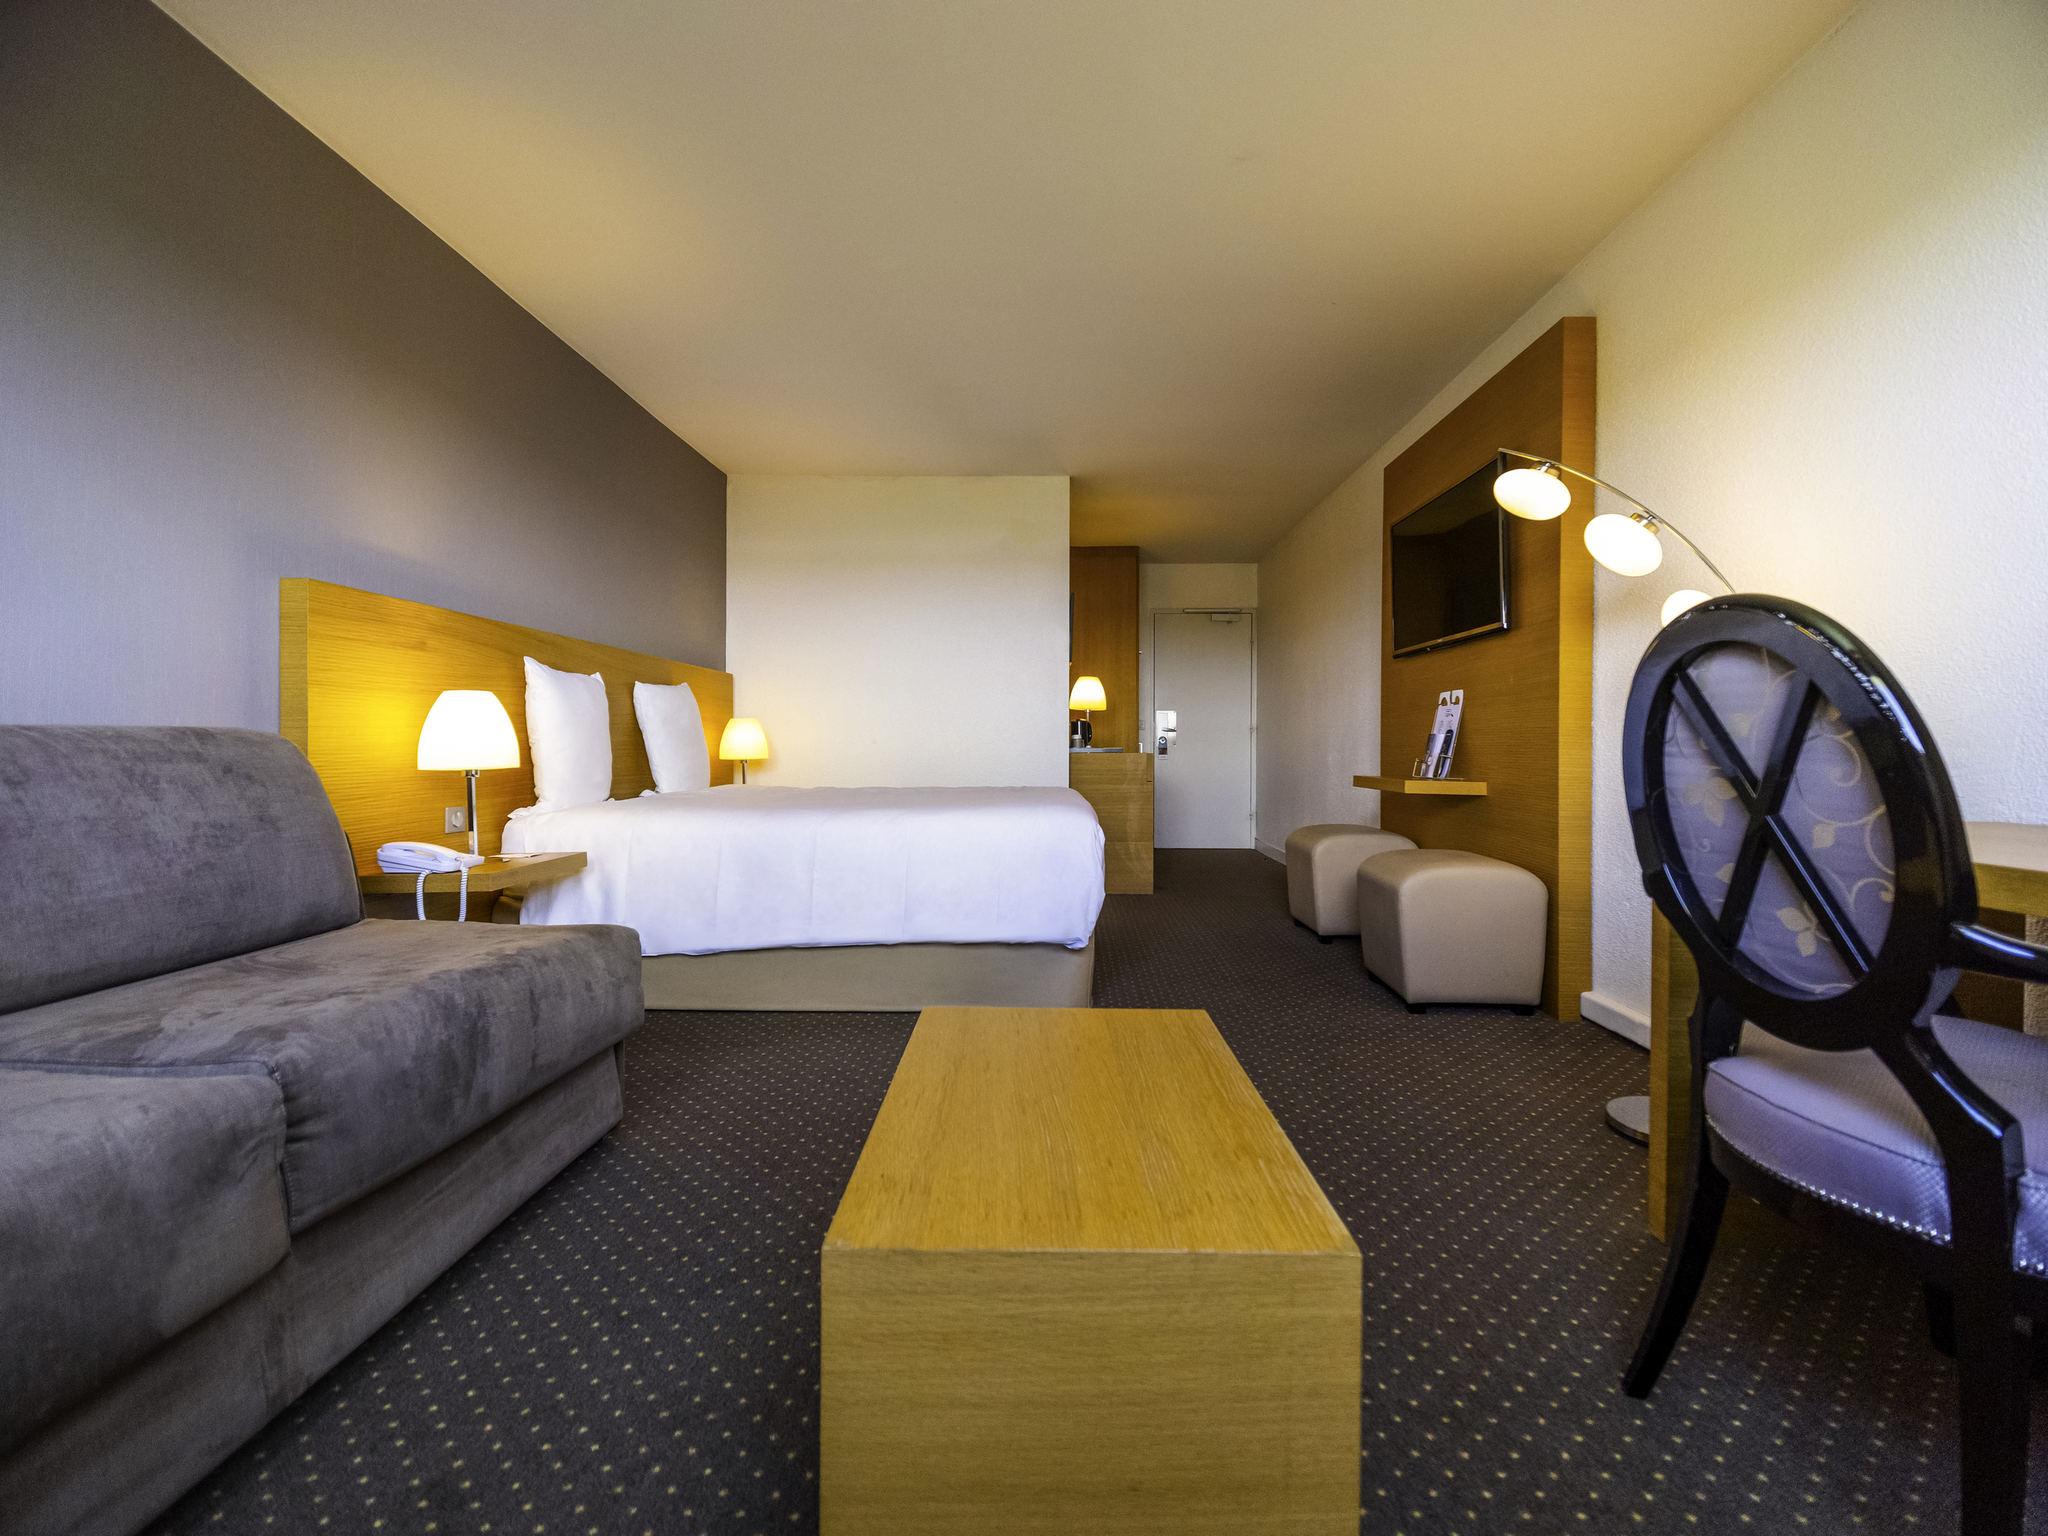 hotel in bordeaux hotel mercure bordeaux lac. Black Bedroom Furniture Sets. Home Design Ideas